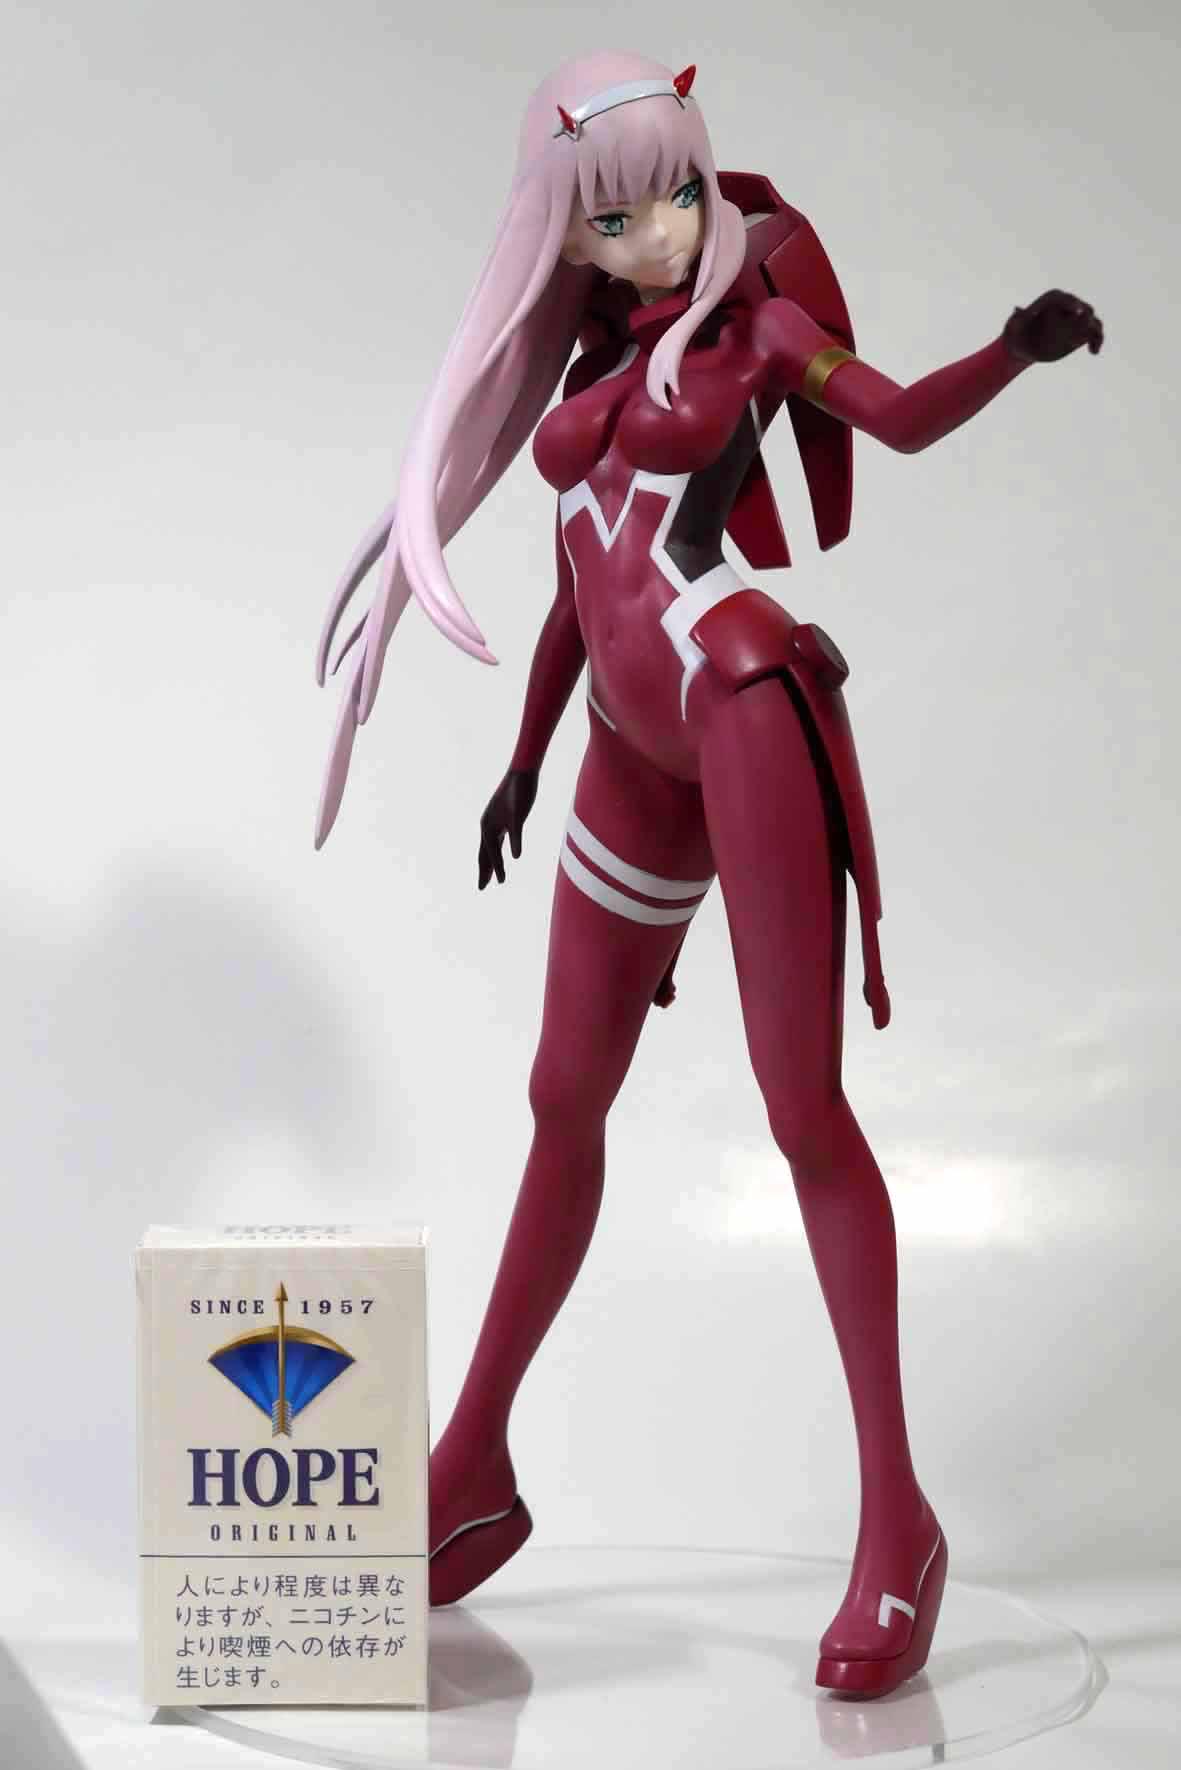 Darling In The Franxx Franxx Zerotwo Anime Figurines Anime Figures Darling In The Franxx